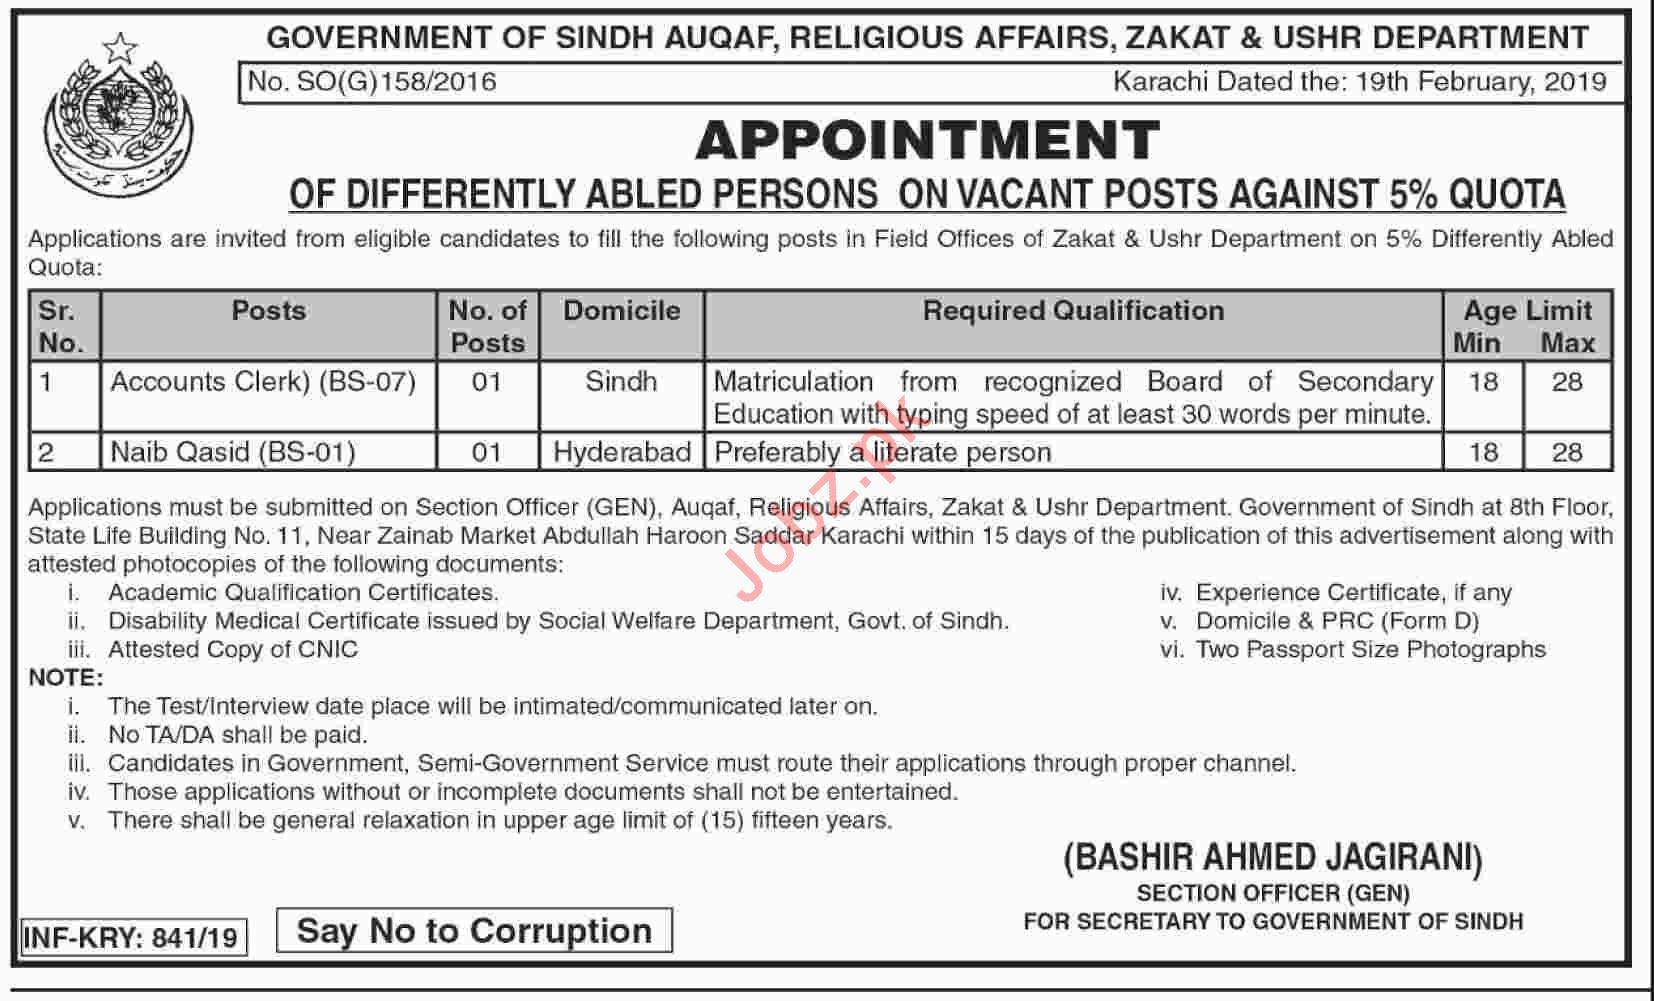 Auqaf Religious Affairs and Zakat & Ushr Department Jobs